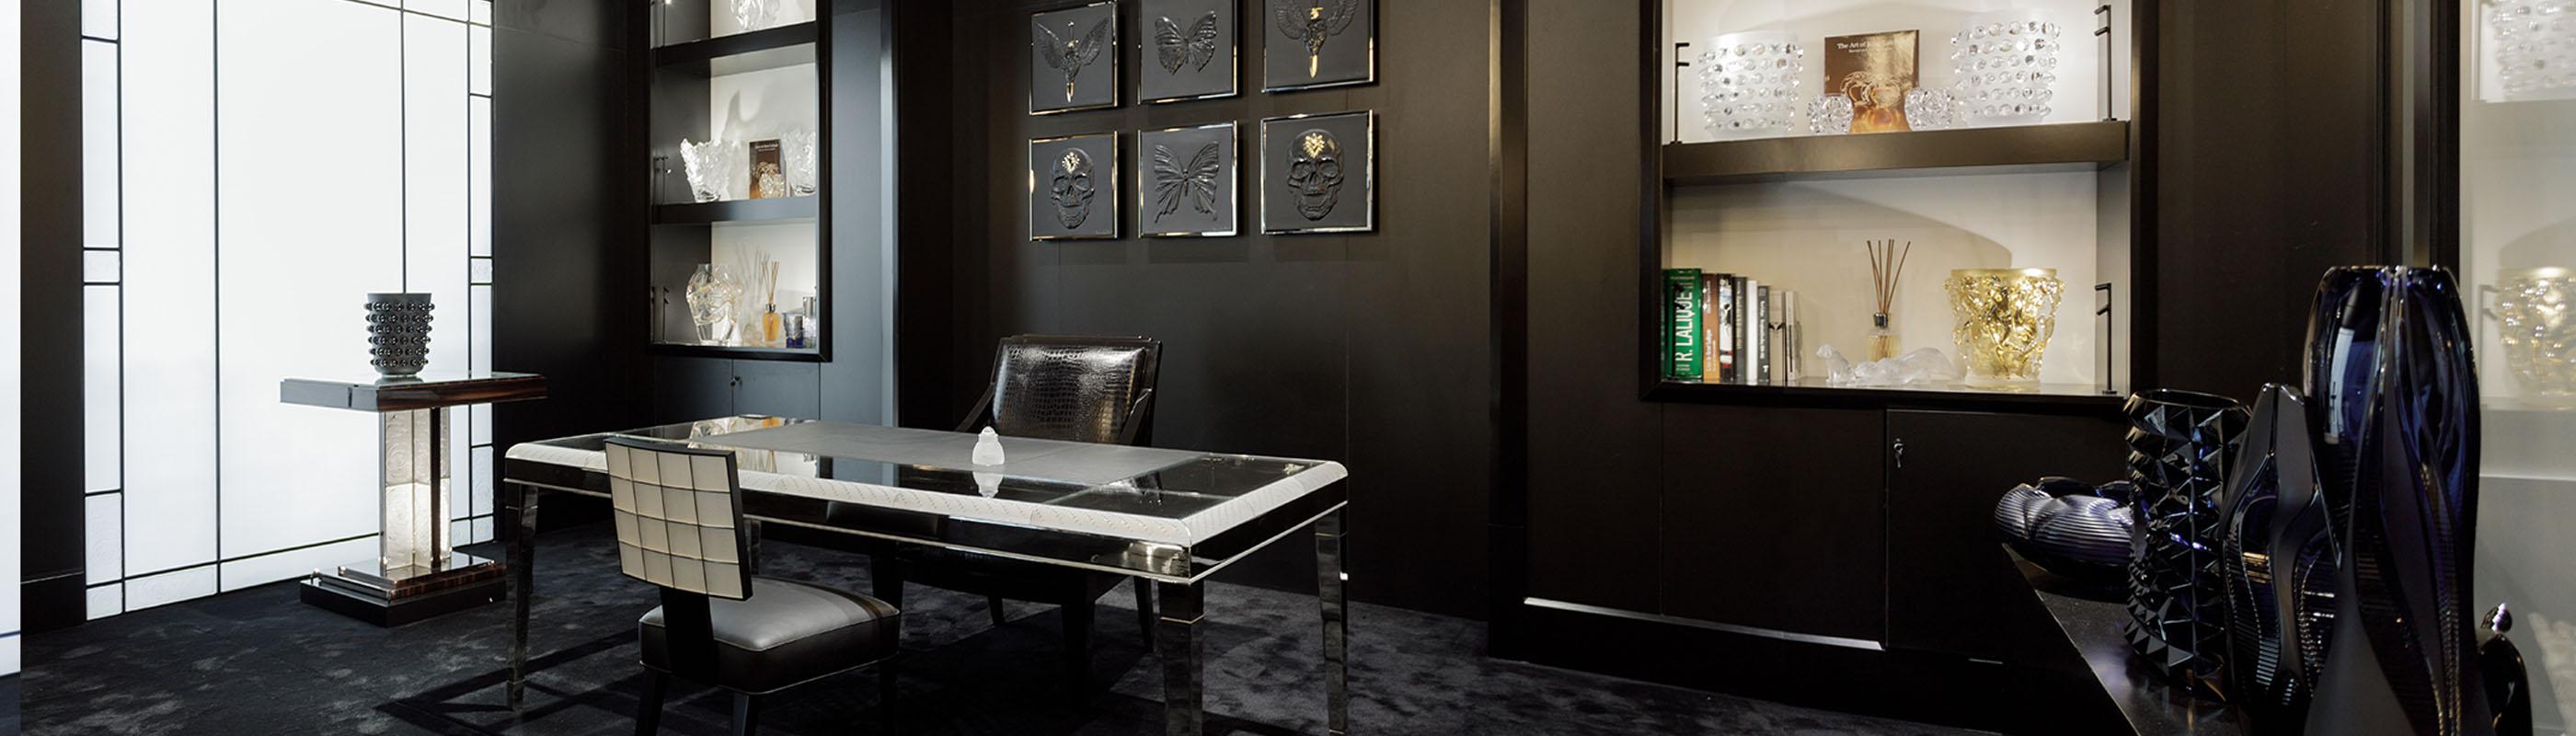 Signature collection - Pierre-Yves Rochon & Lalique